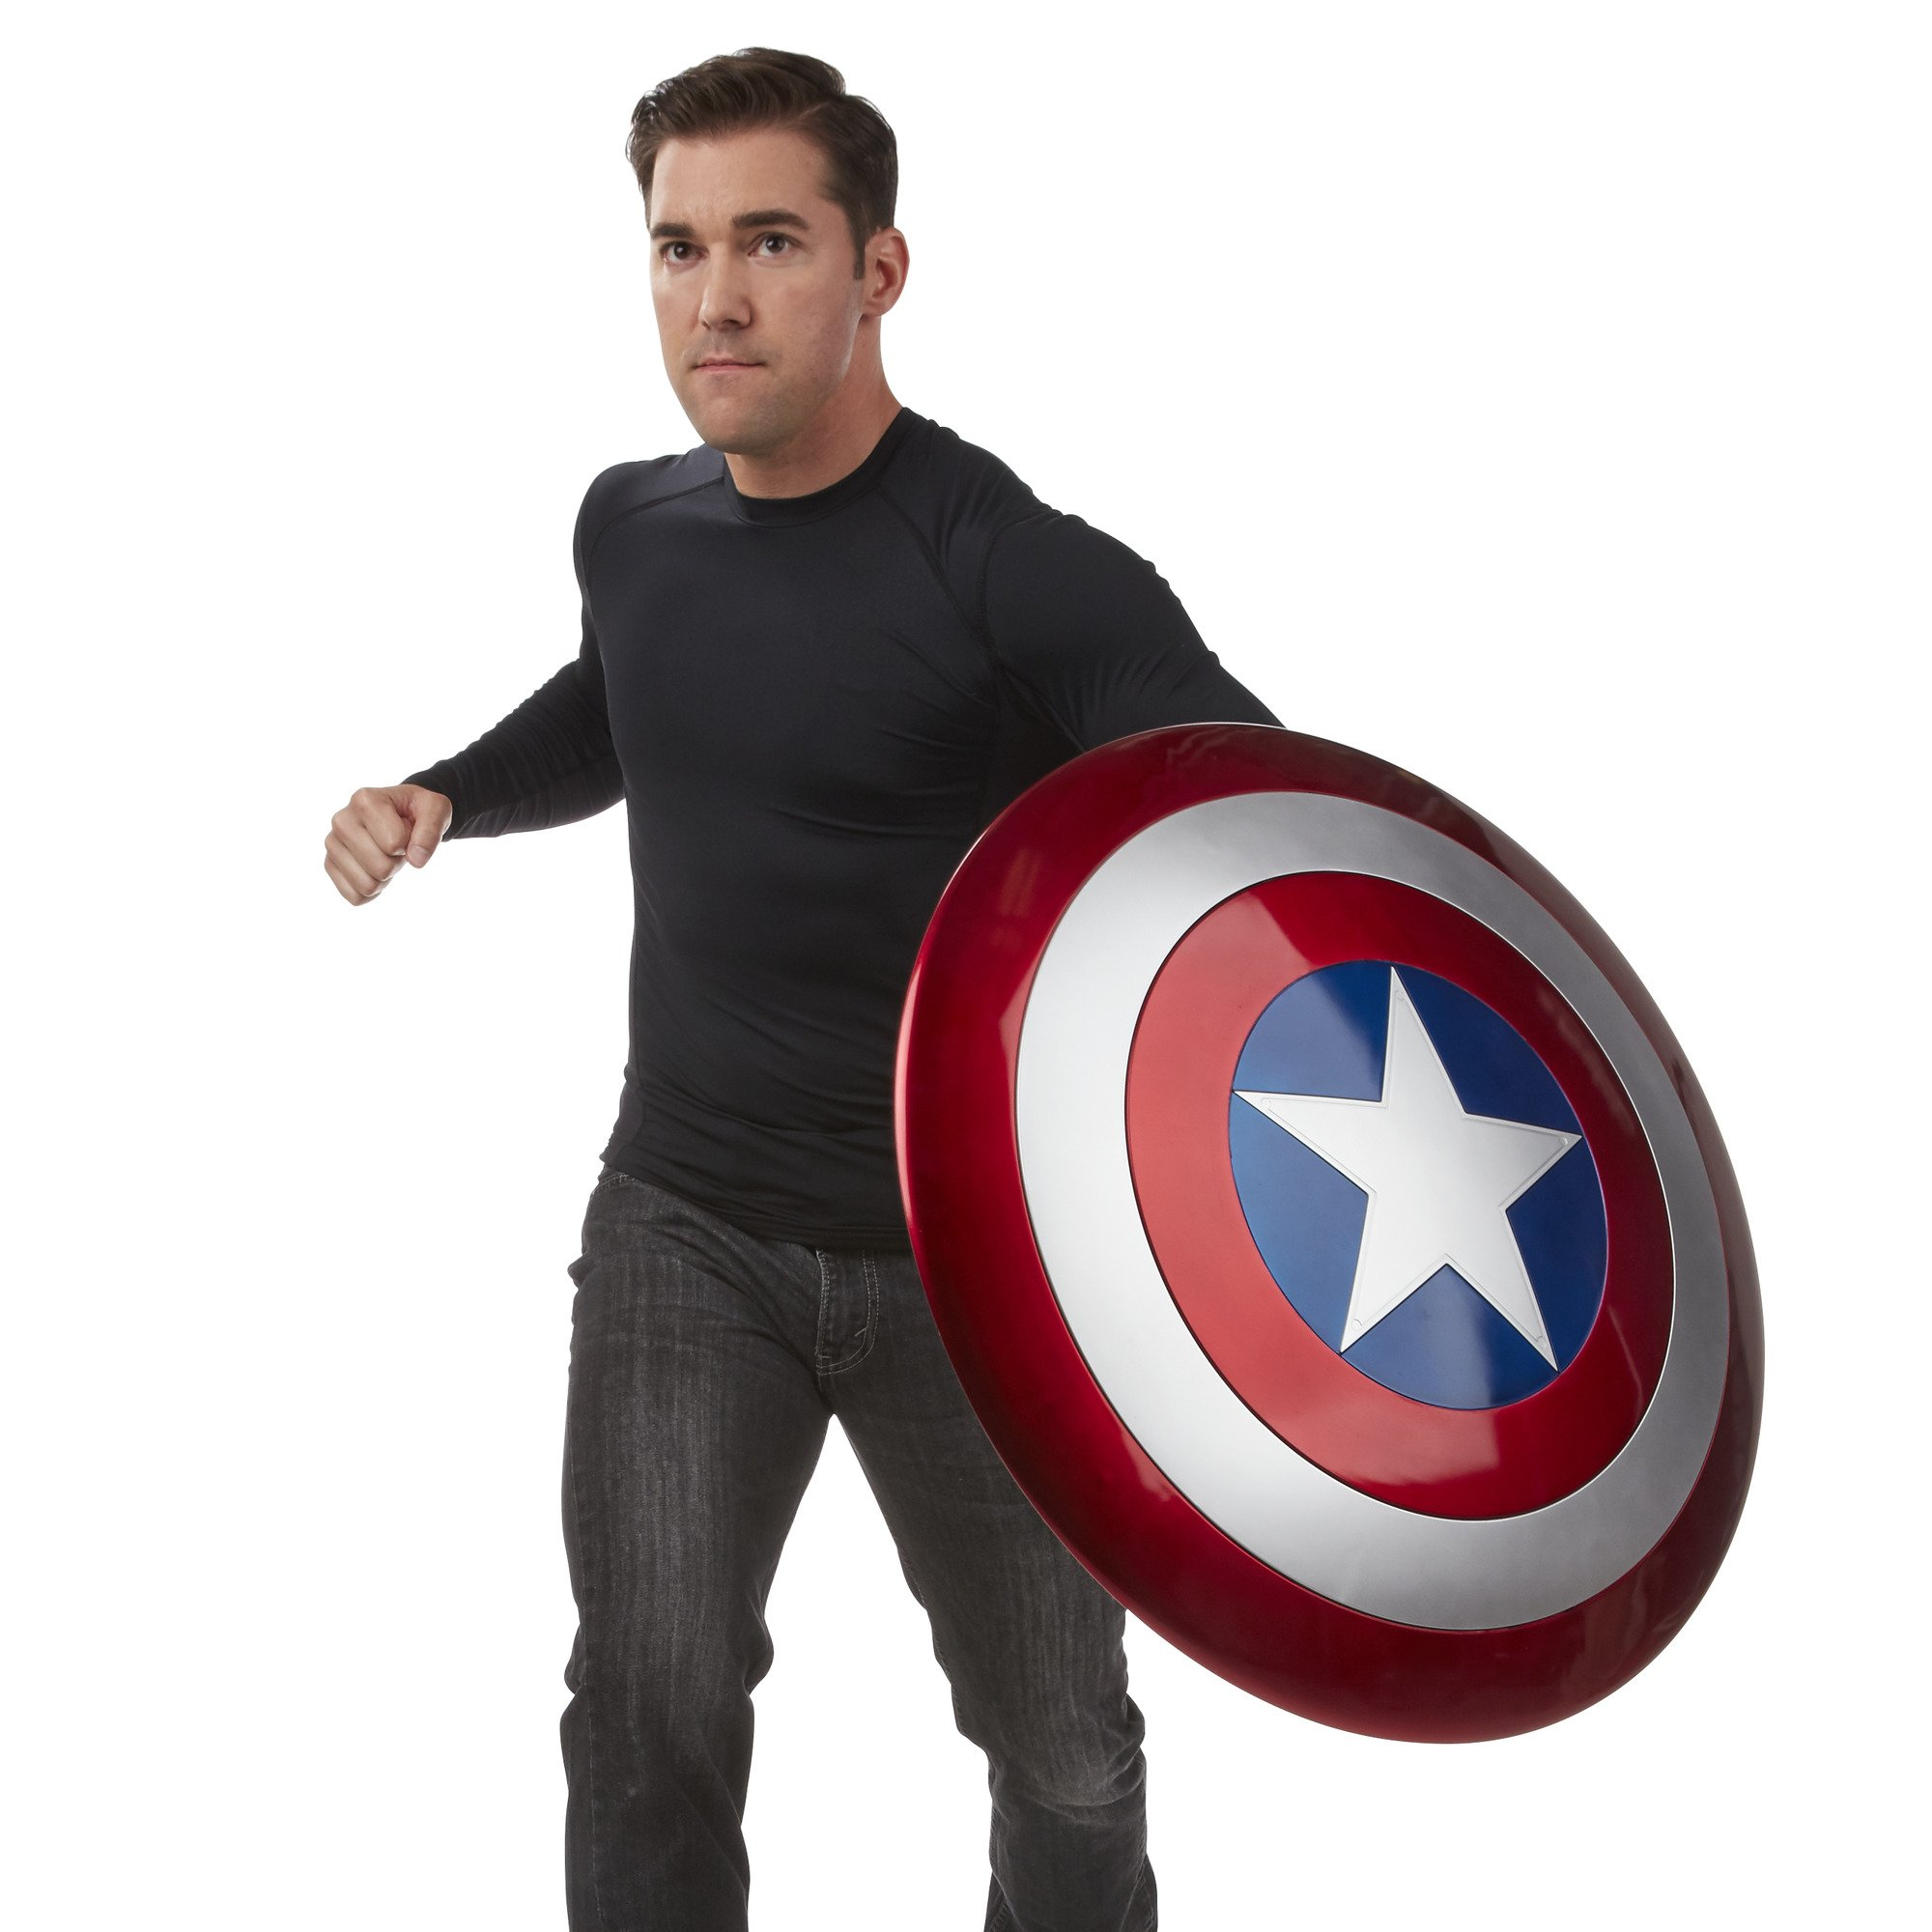 Marvel Legends Captain America Shield by Avengers (Image #7)